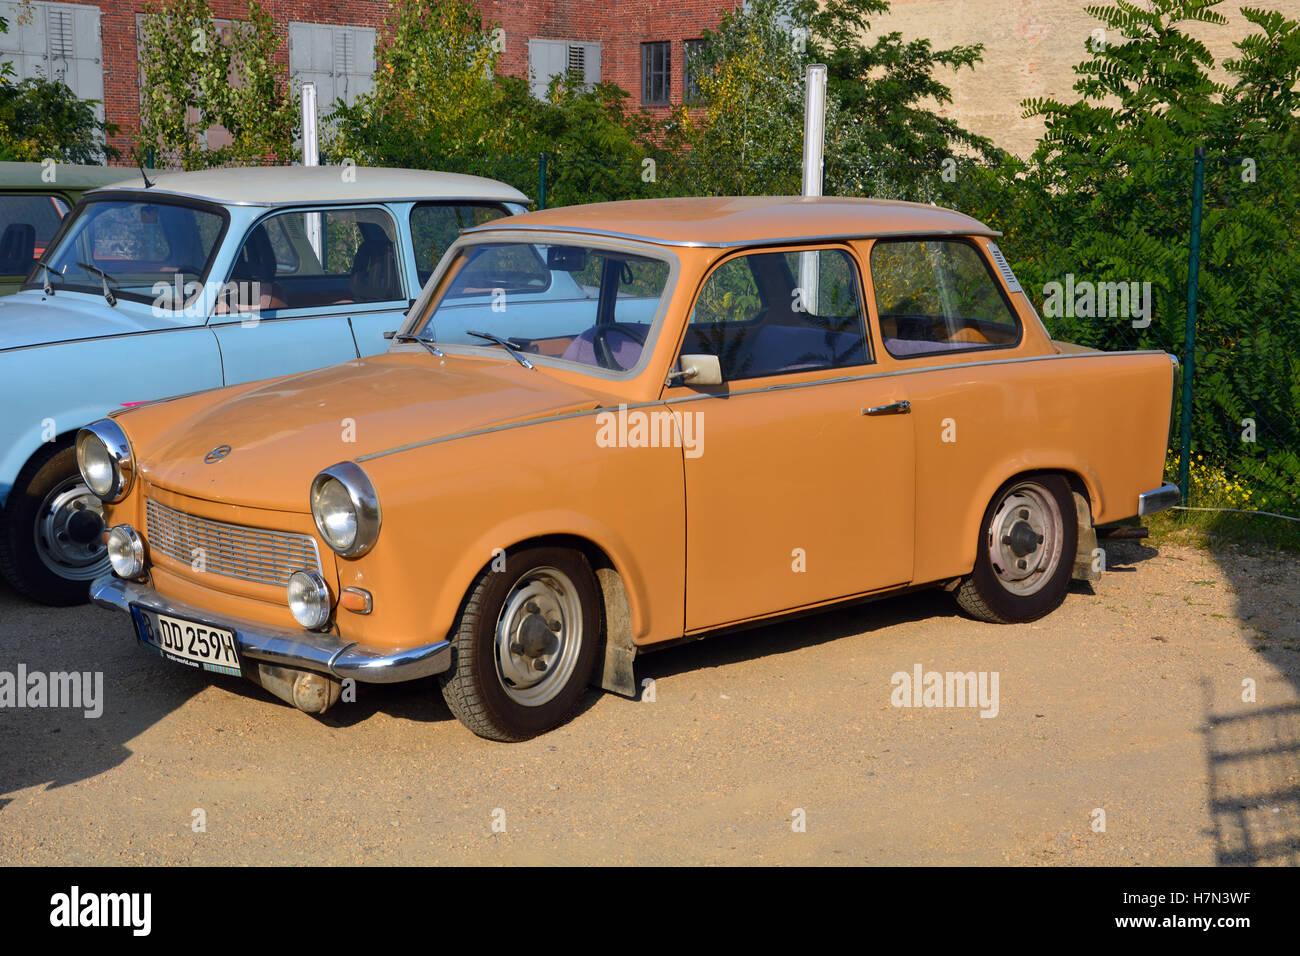 East Orange Car Rental